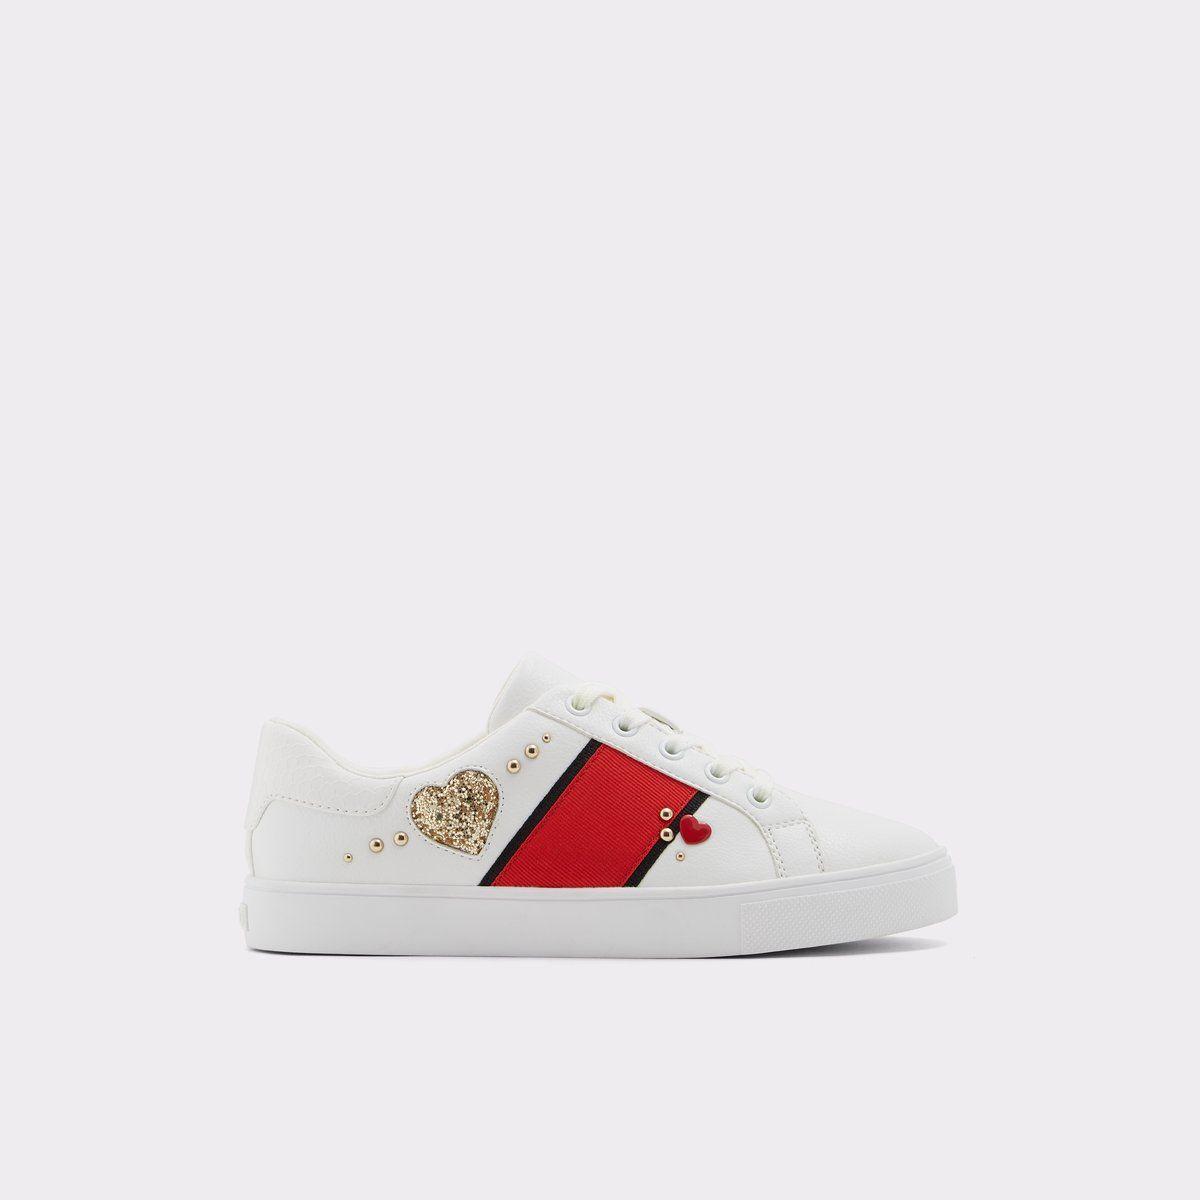 Casual sneakers women, Aldo shoes women